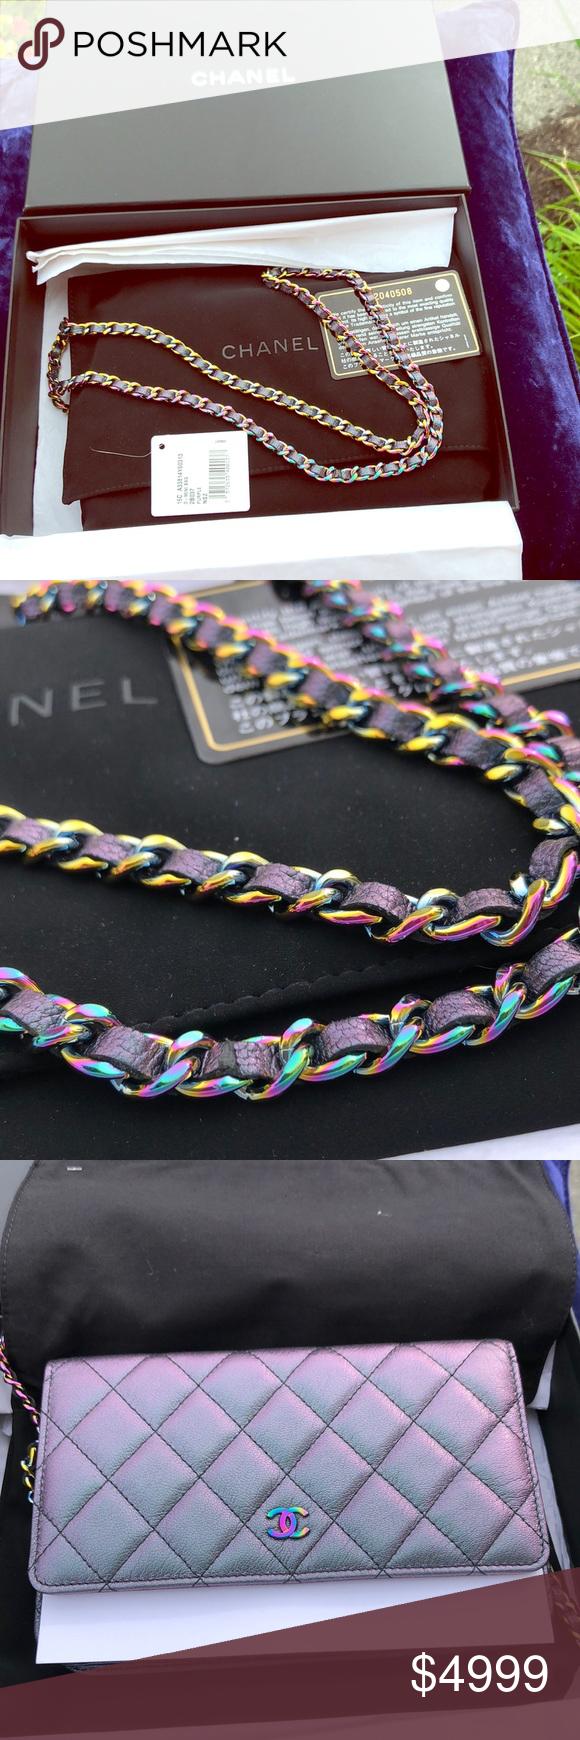 3fbbd5ea2e3b 🇮🇹Chanel🇮🇹Mermaid Iridescent Rainbow Chain WOC 🇮🇹CHANEL 🇮🇹MERMAID